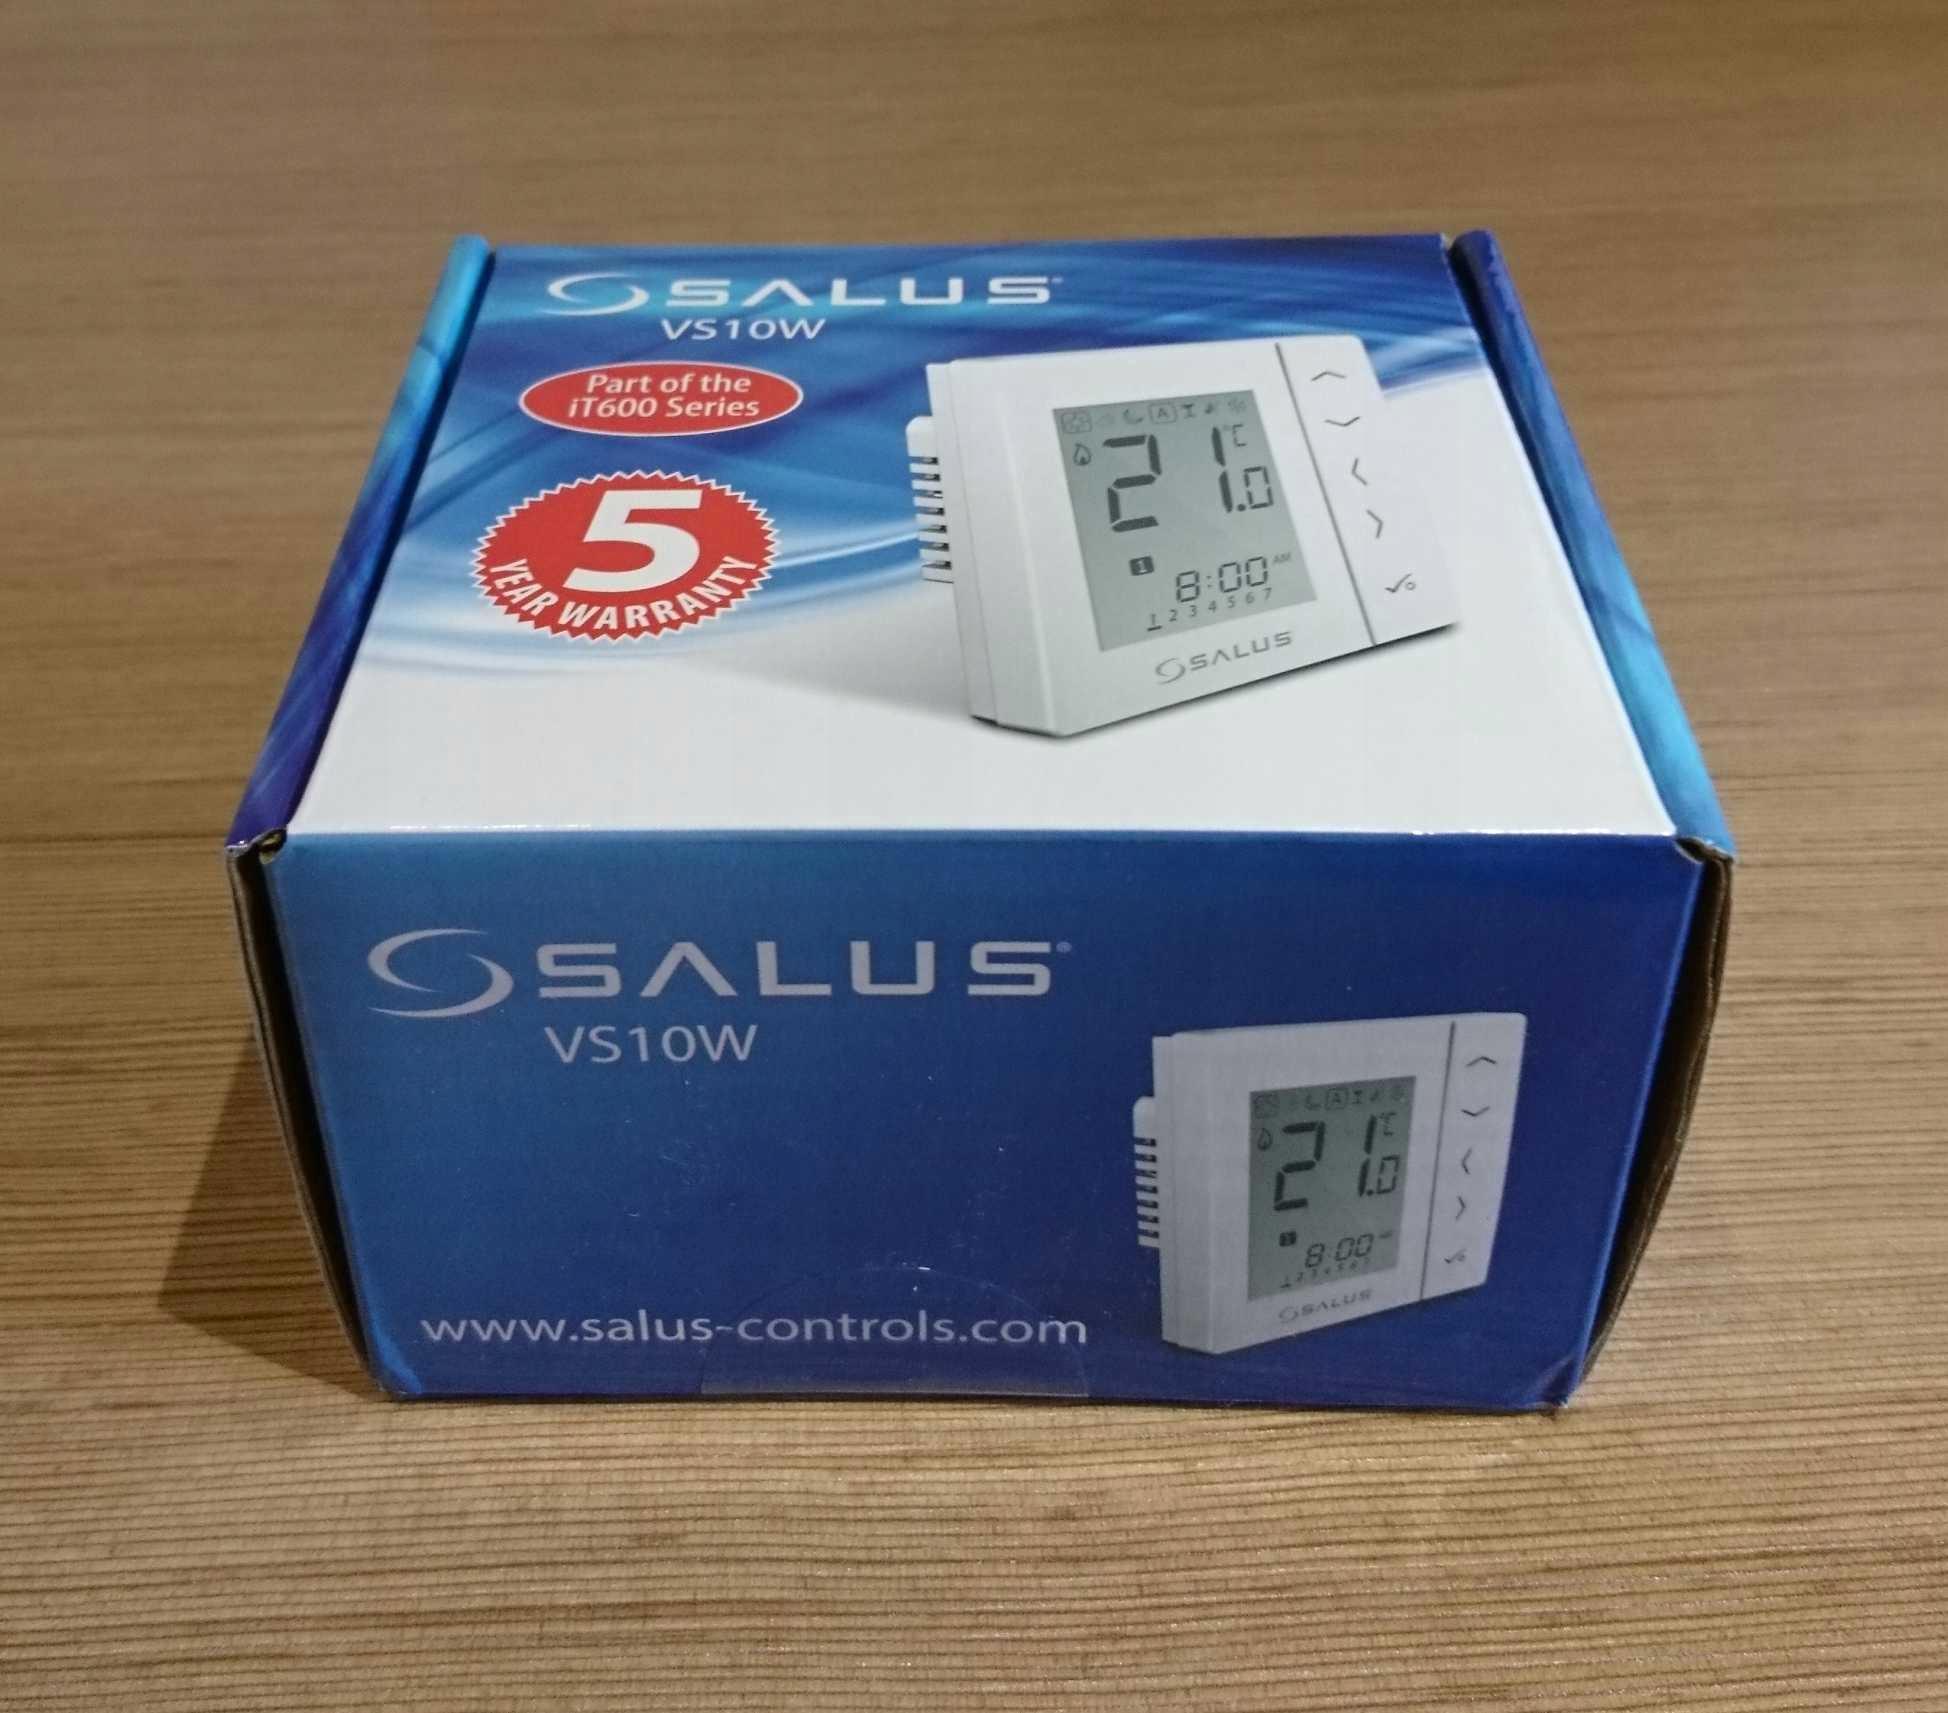 Salus VS10W cyfrowy regulator temperatury